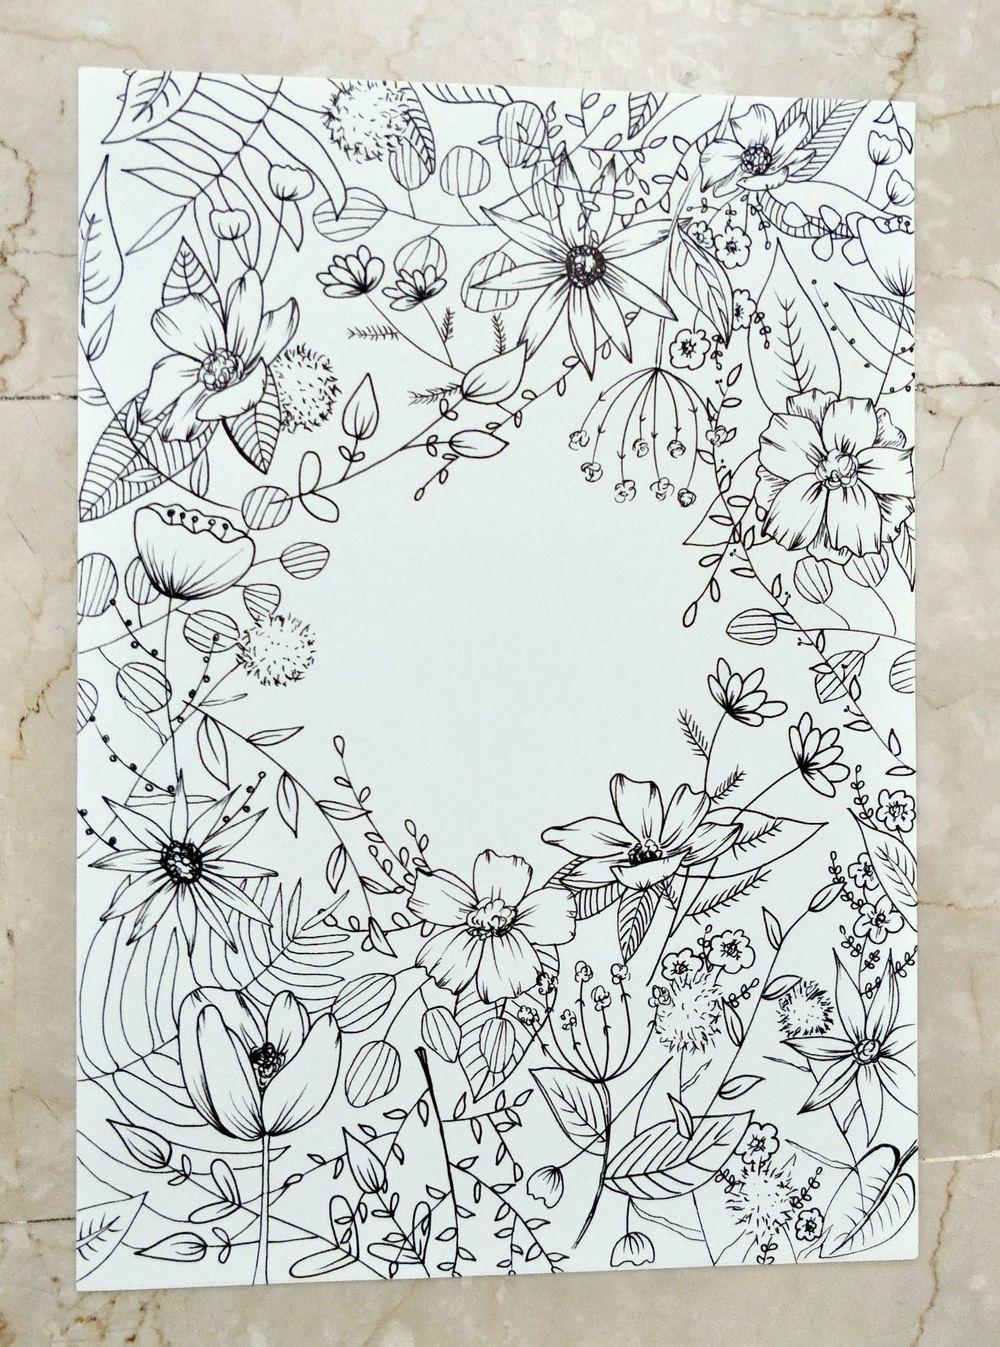 Floral Illustration: Composition Meets Negative Space - image 2 - student project